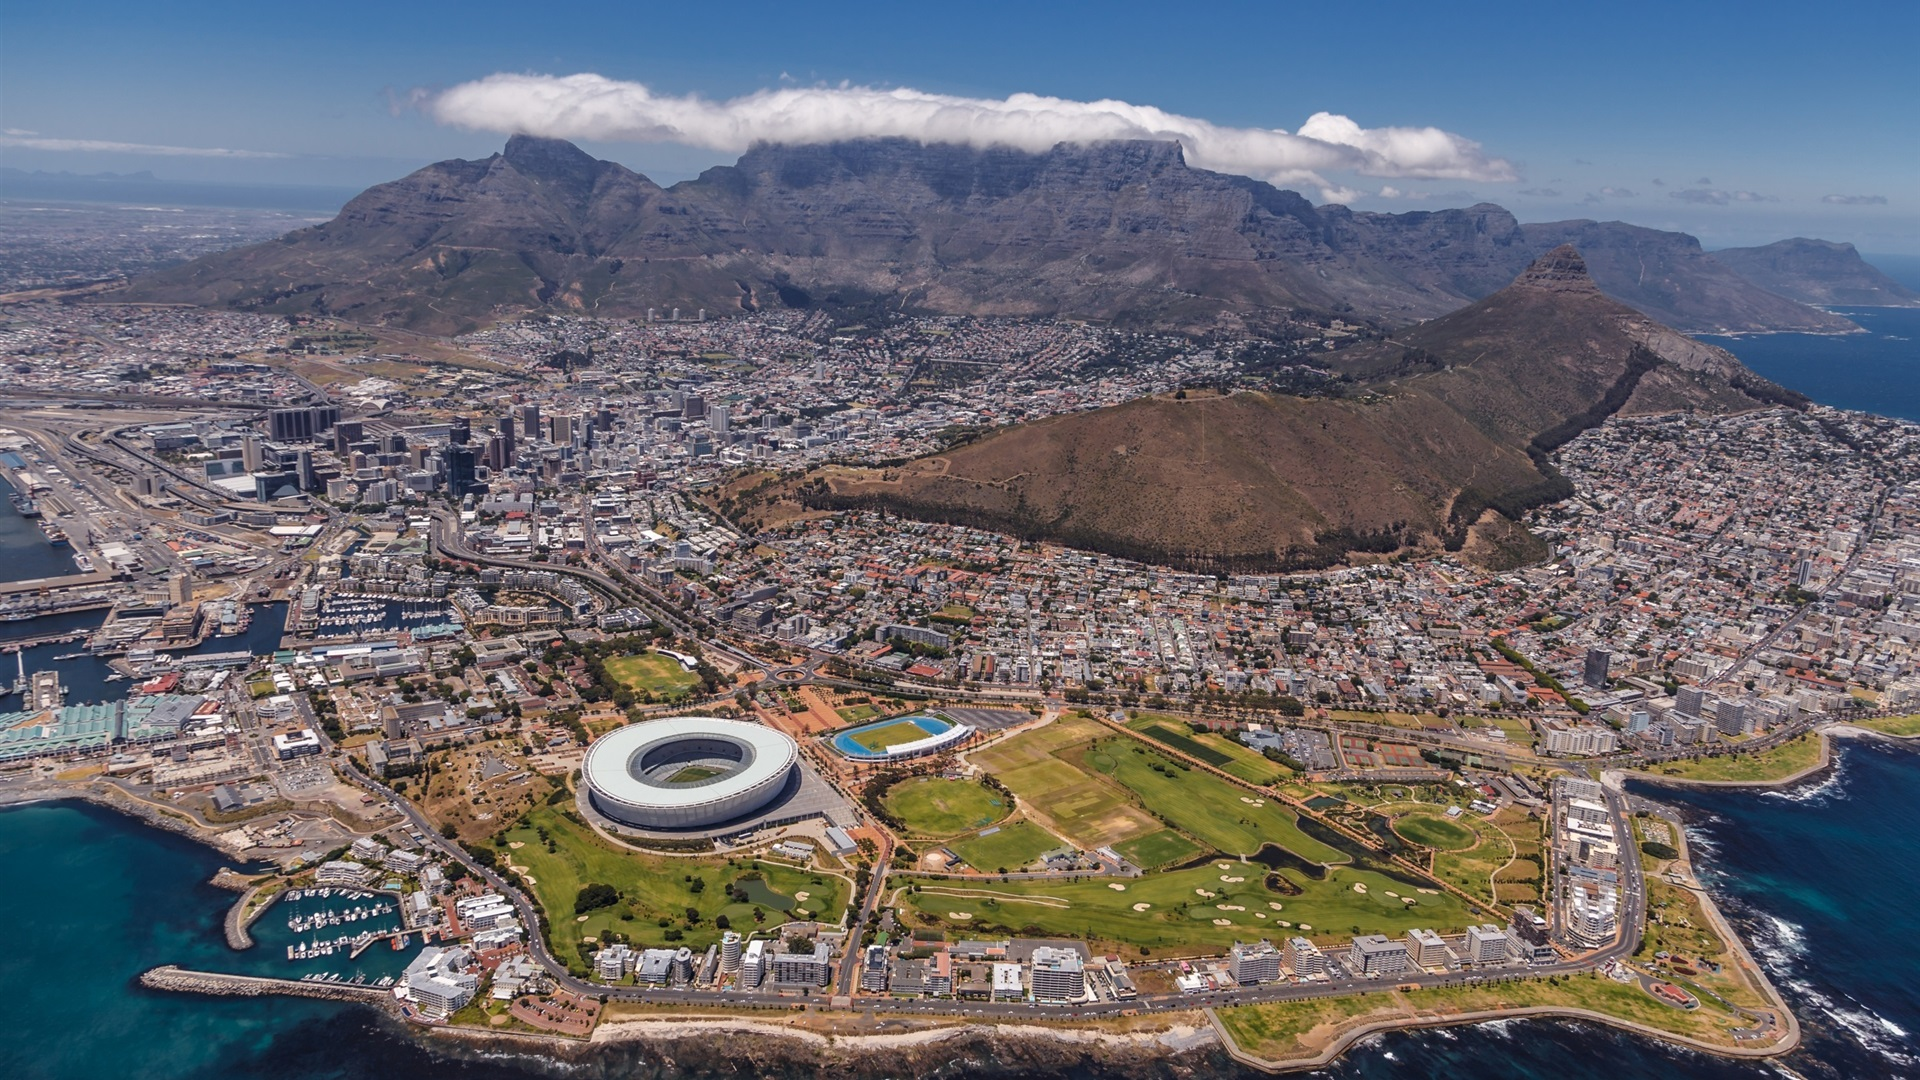 Cape Town City Wallpaper: 壁紙 南アフリカ、ケープタウン 2560x1600 HD 無料のデスクトップの背景, 画像